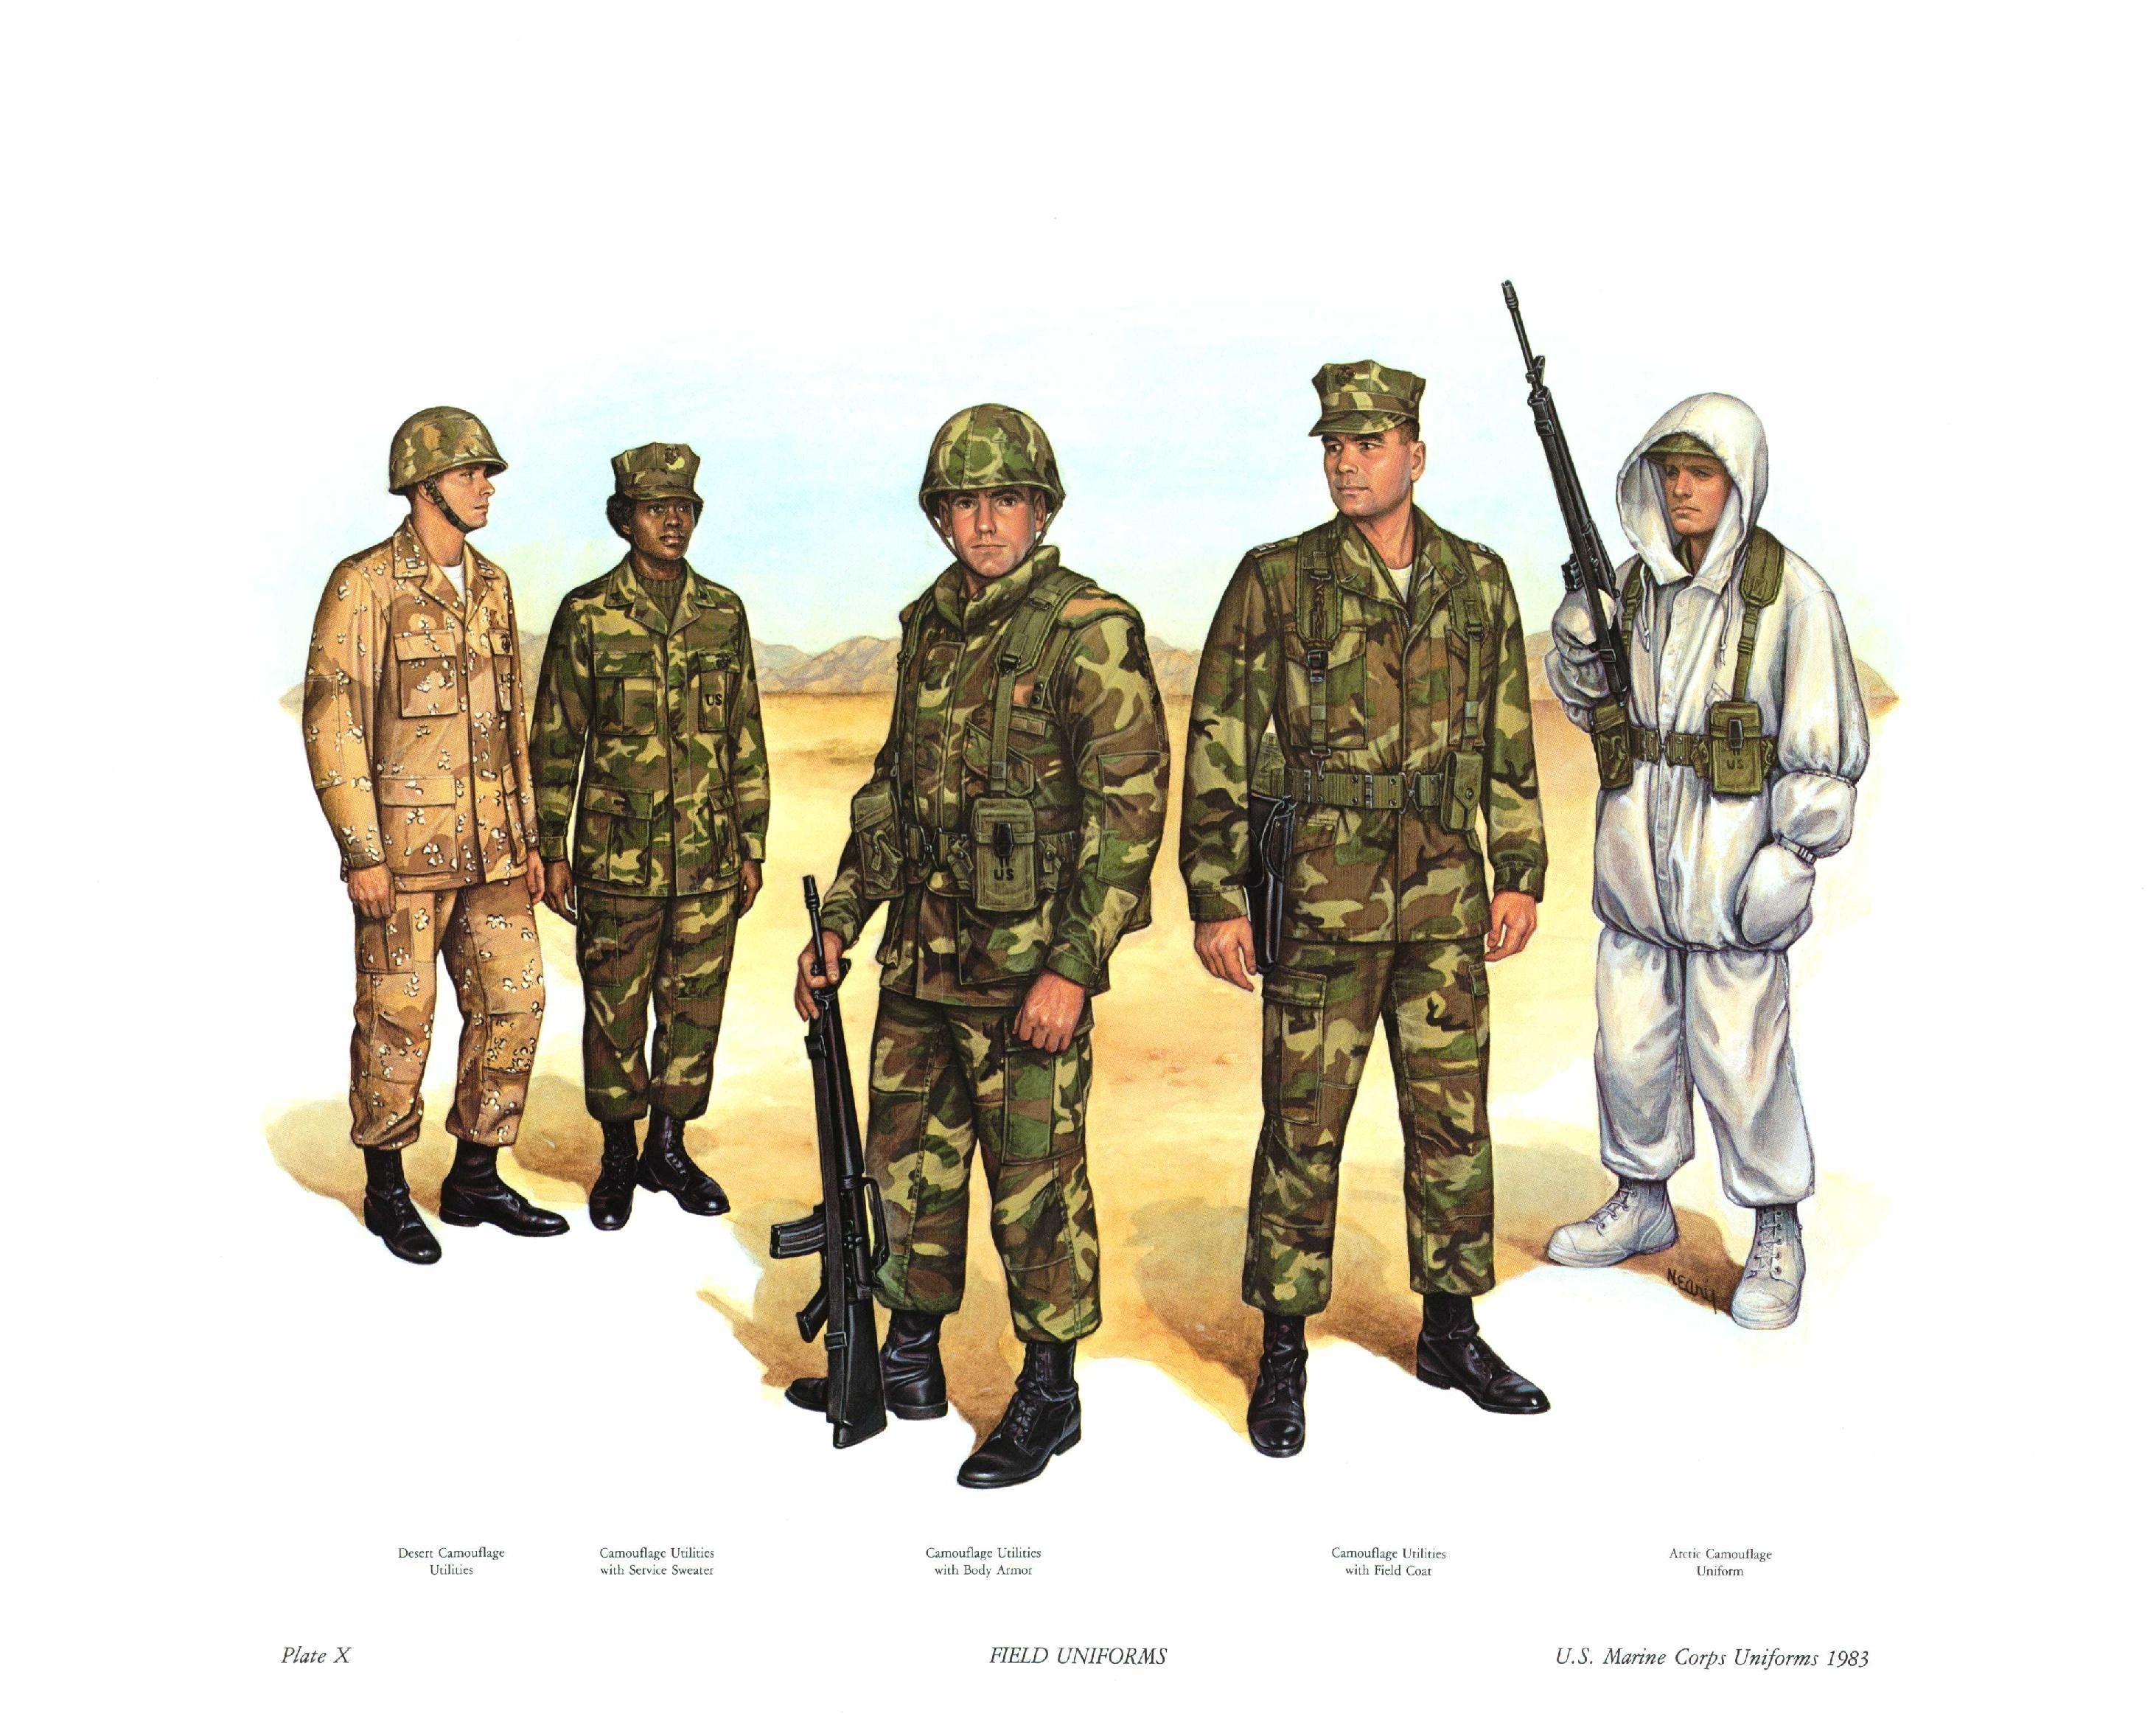 Uniforms marines pictures Uniforms of